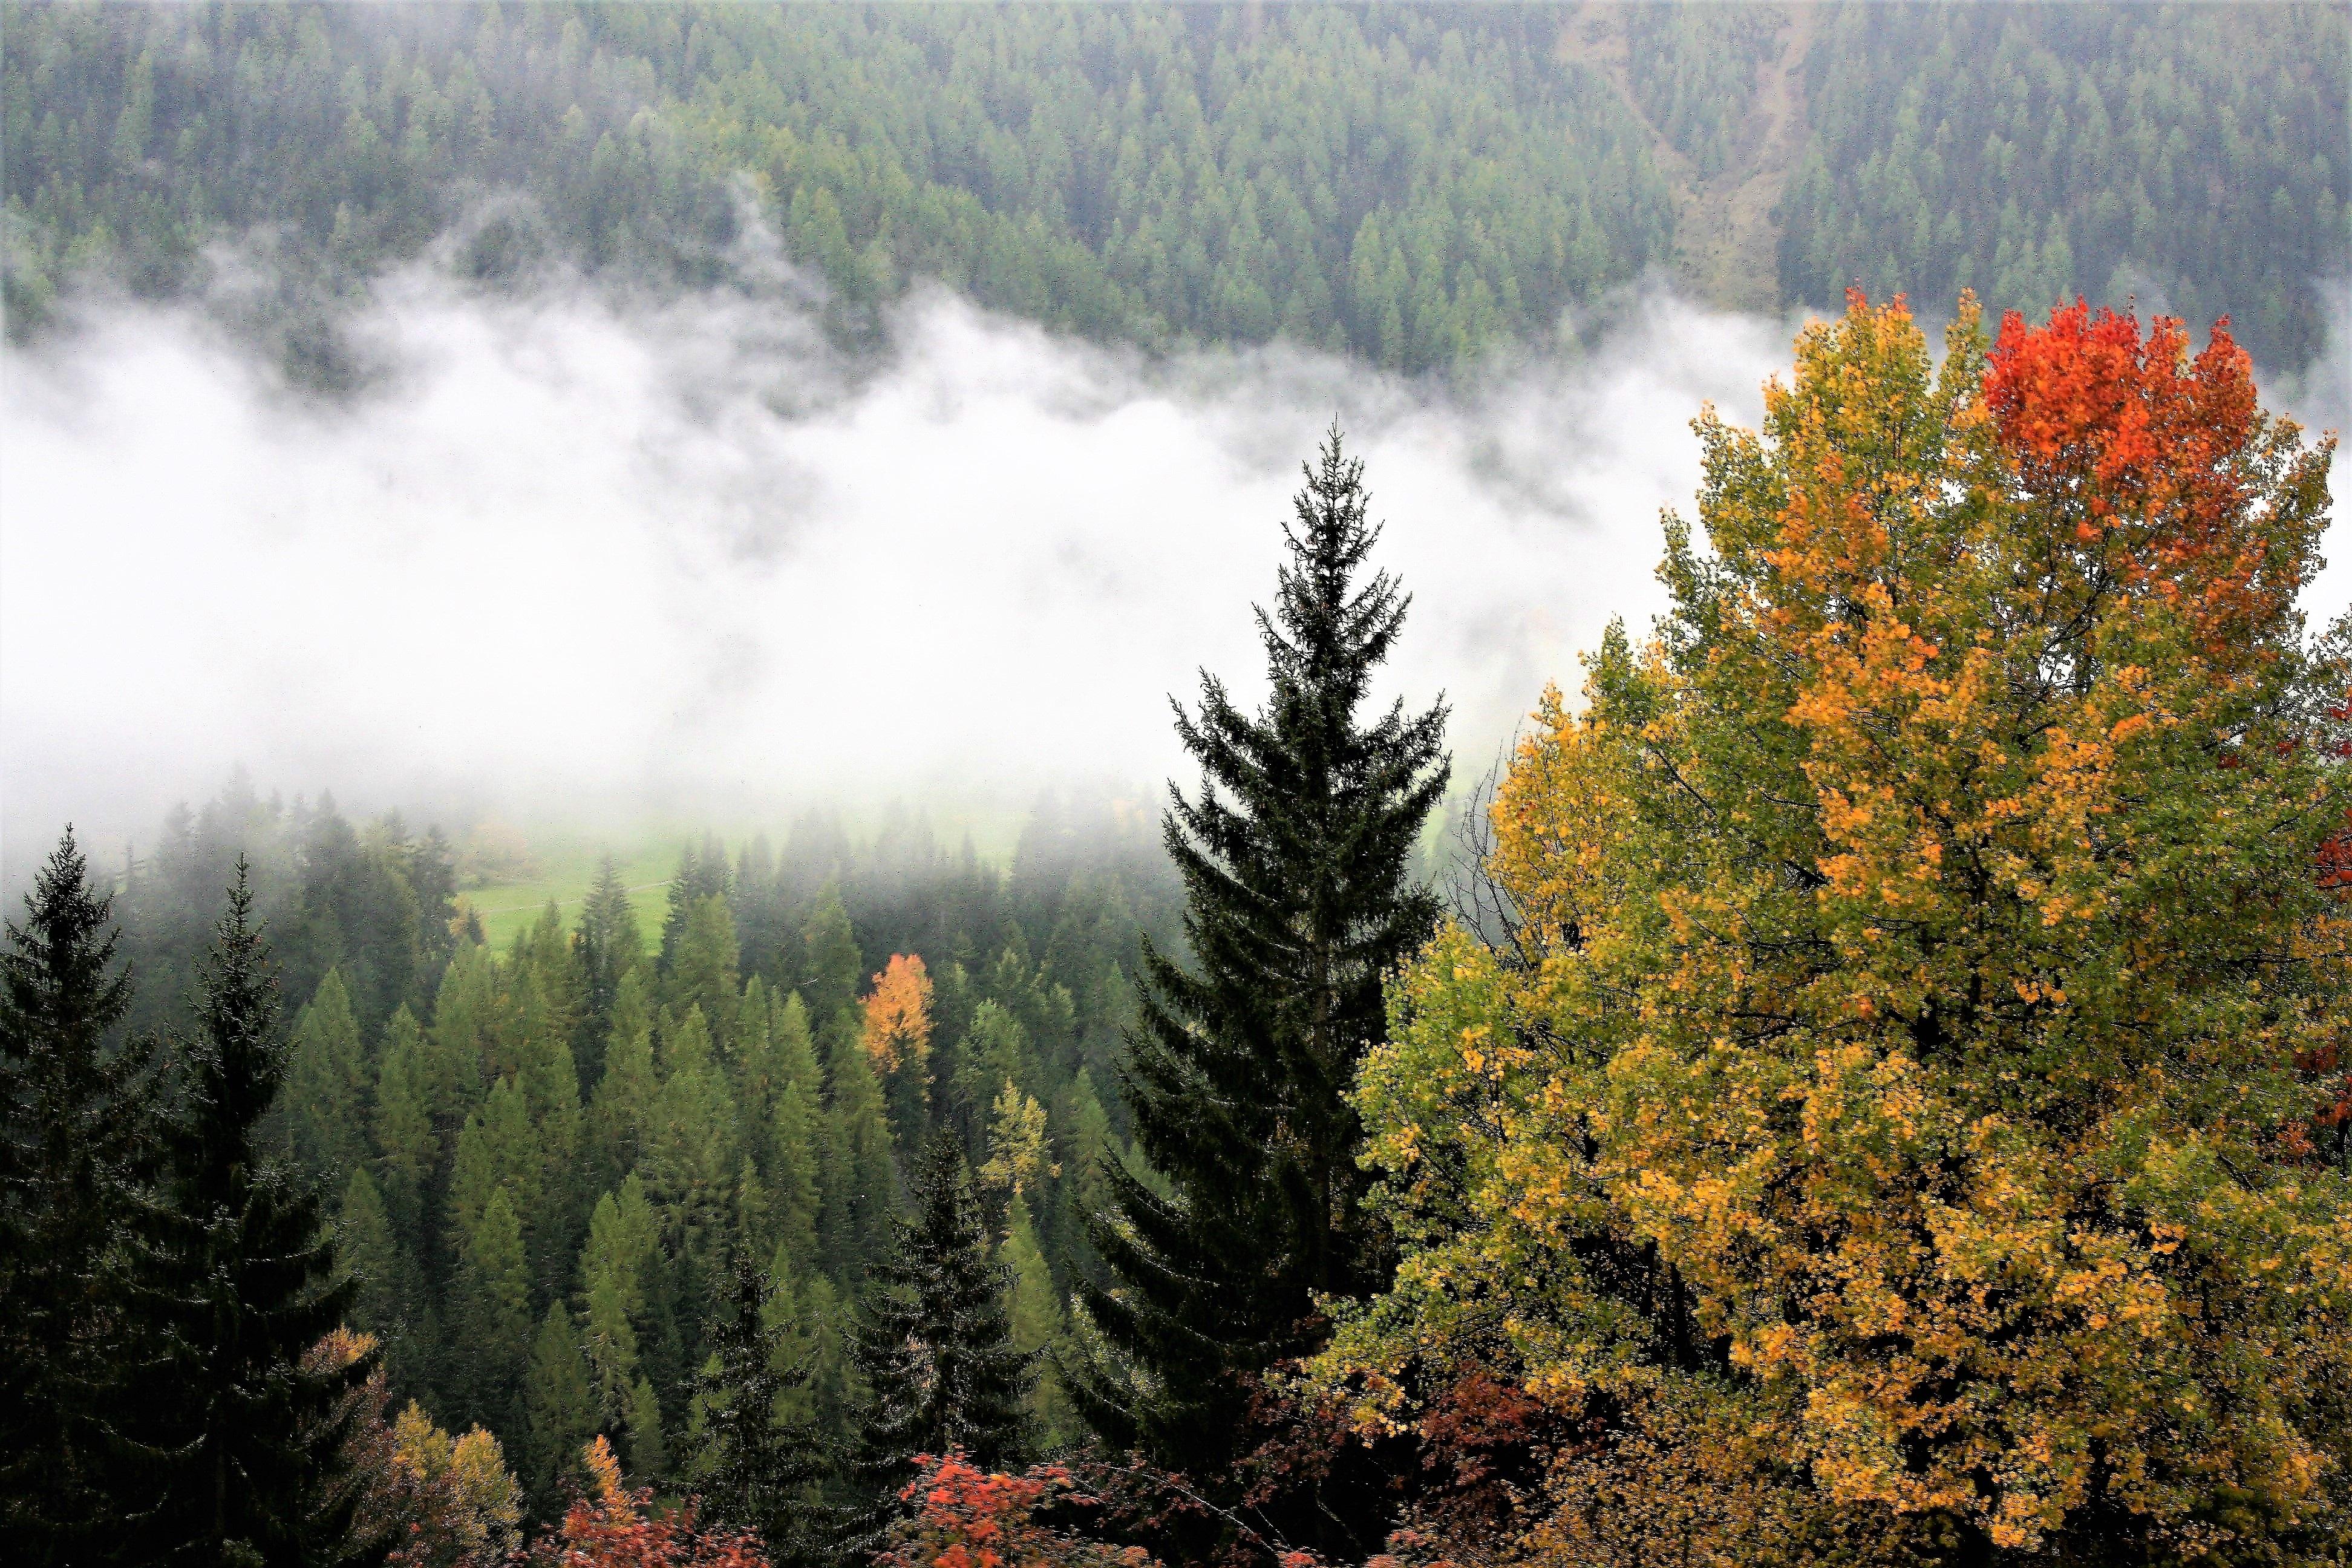 Misty forest. Photo.